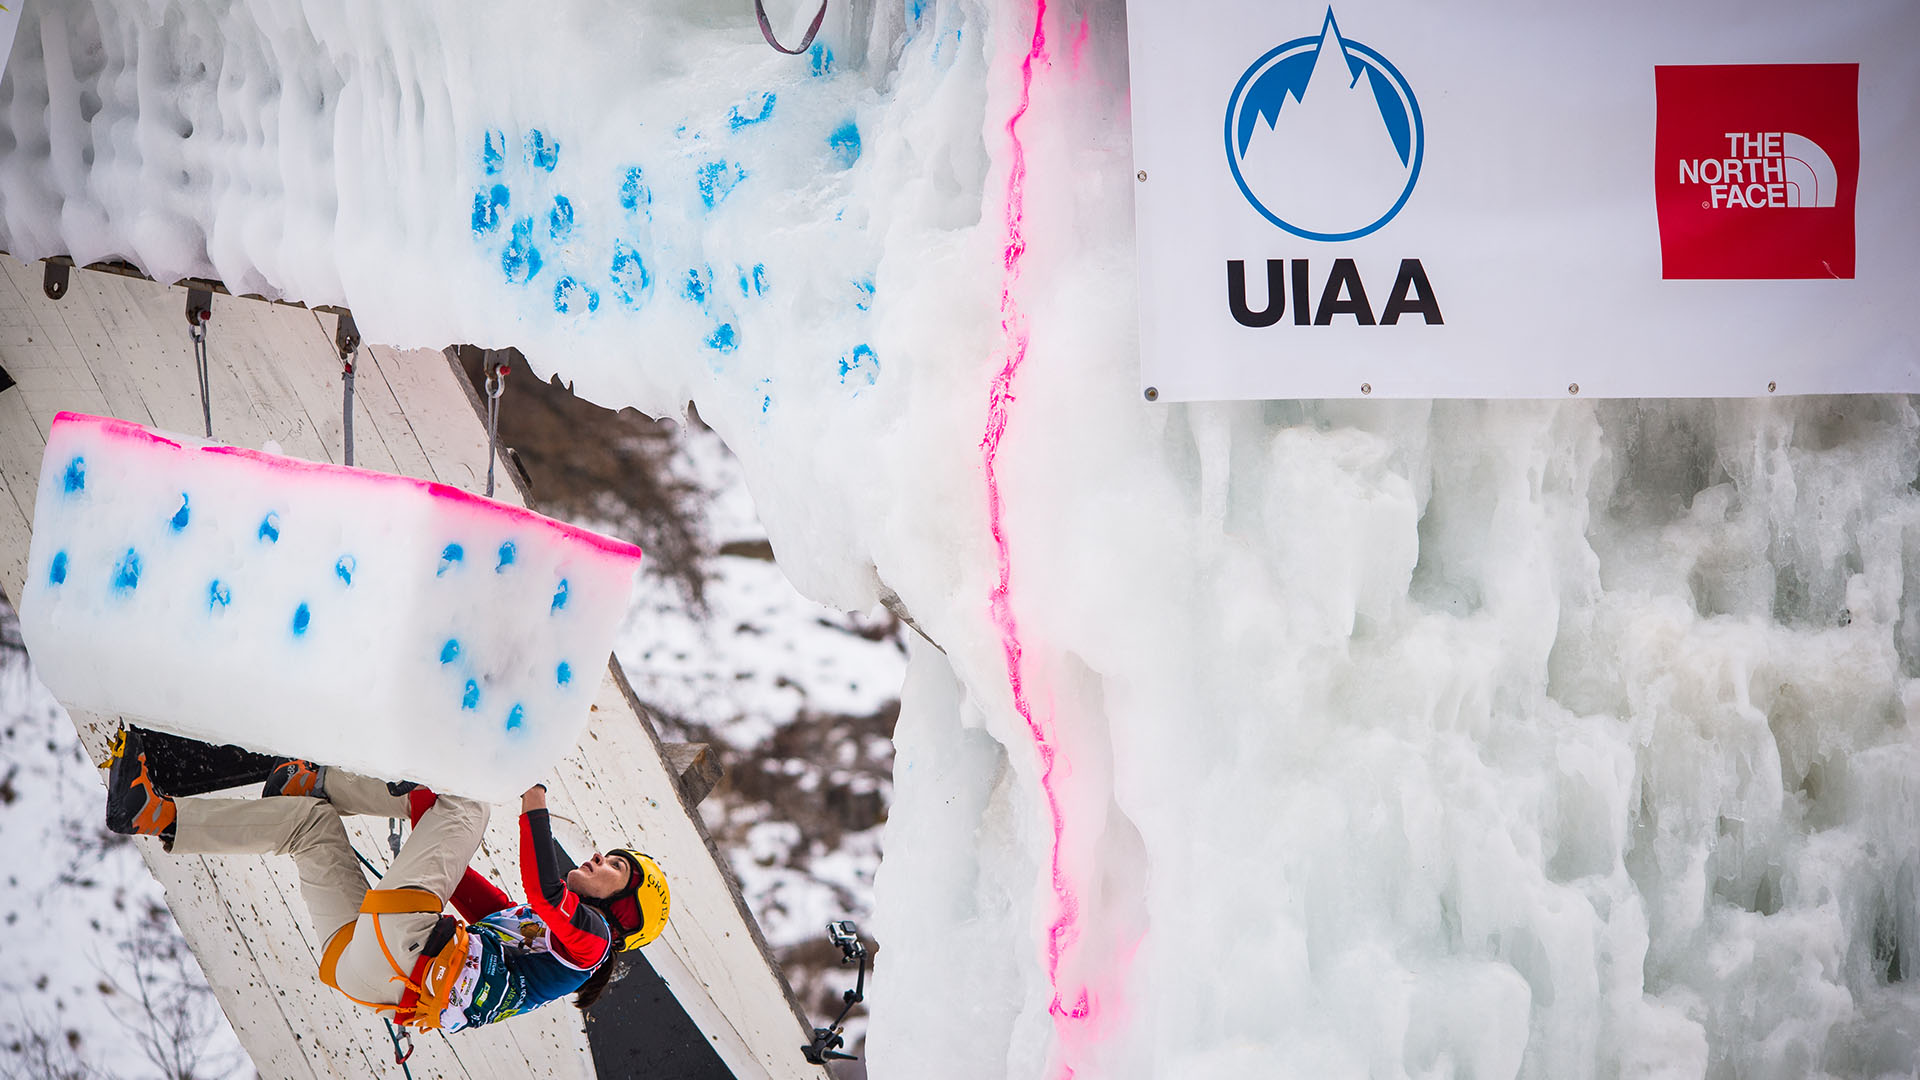 uiaa-ice-climbing-1920x1080